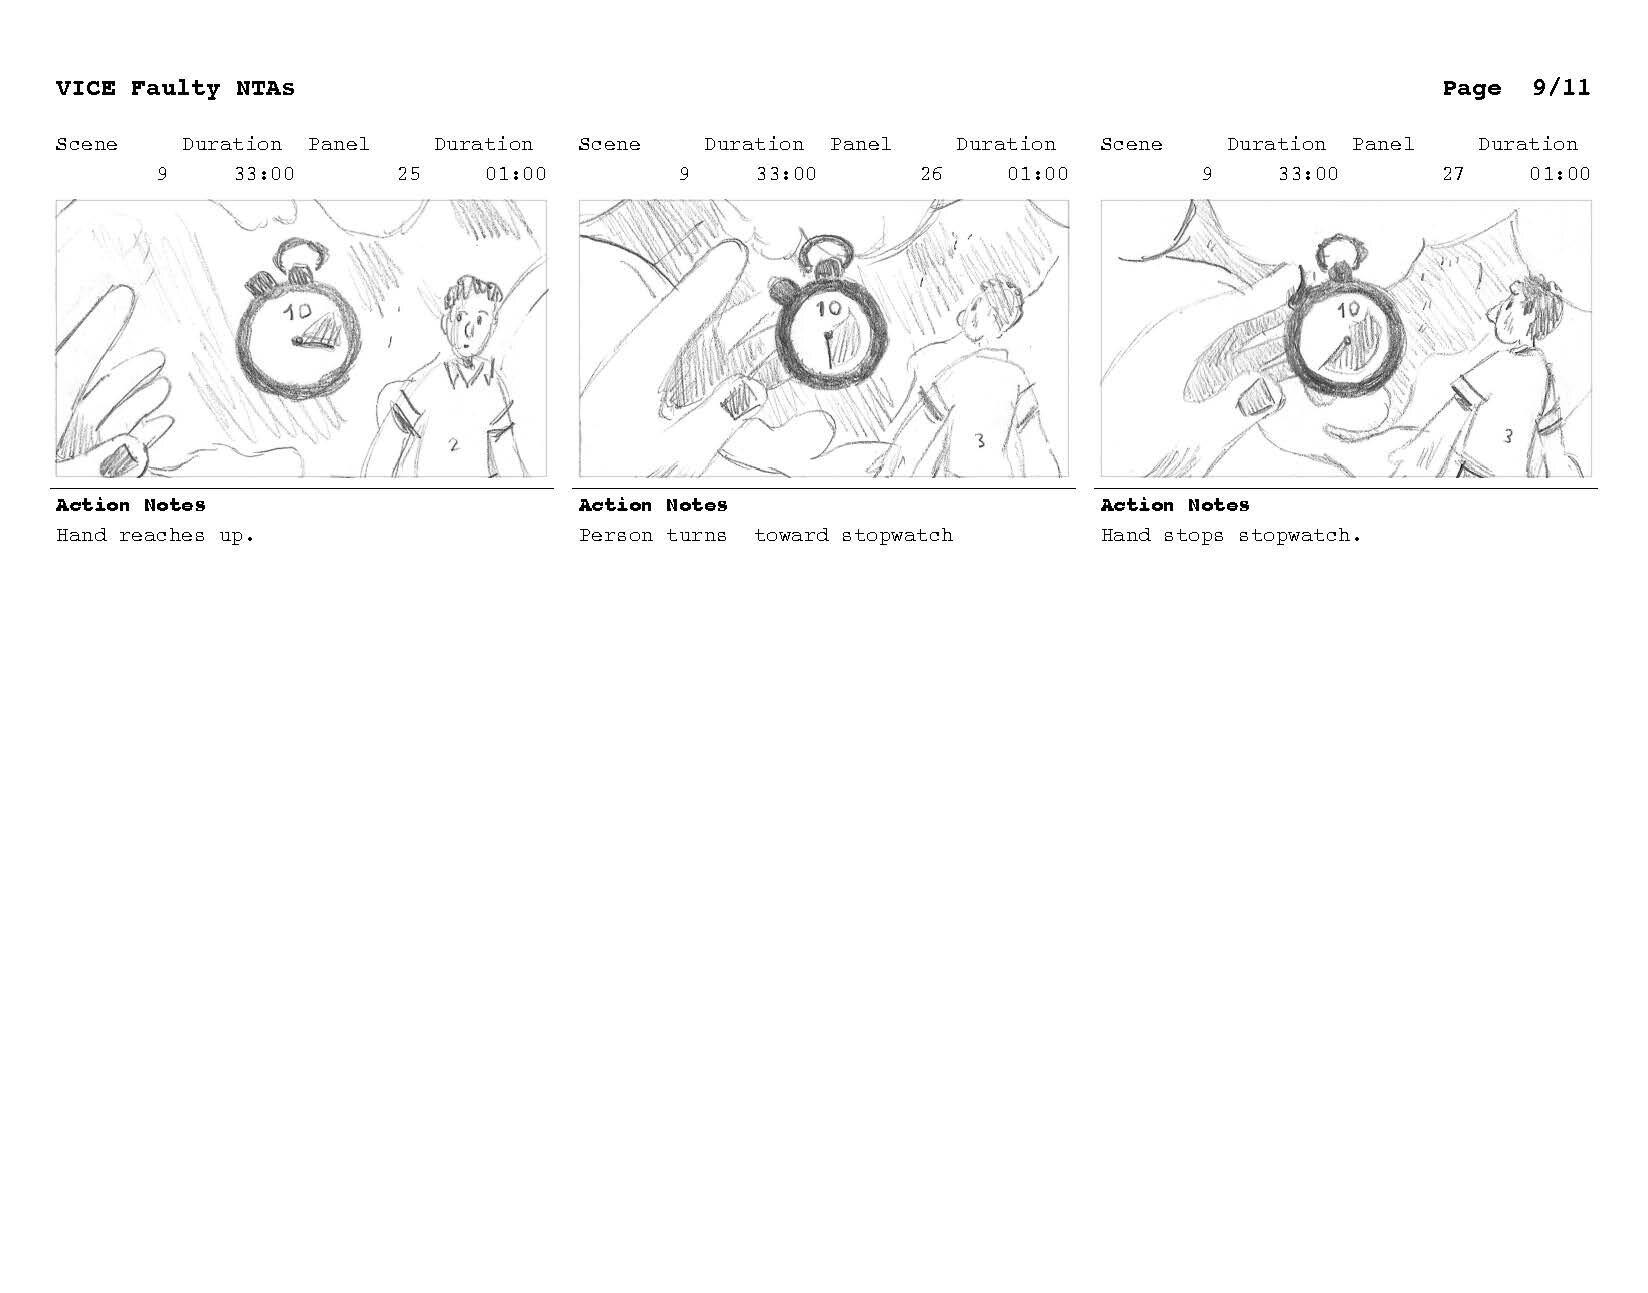 VICE News Tonight - Faulty NTAs storyboard_Page_09.jpg